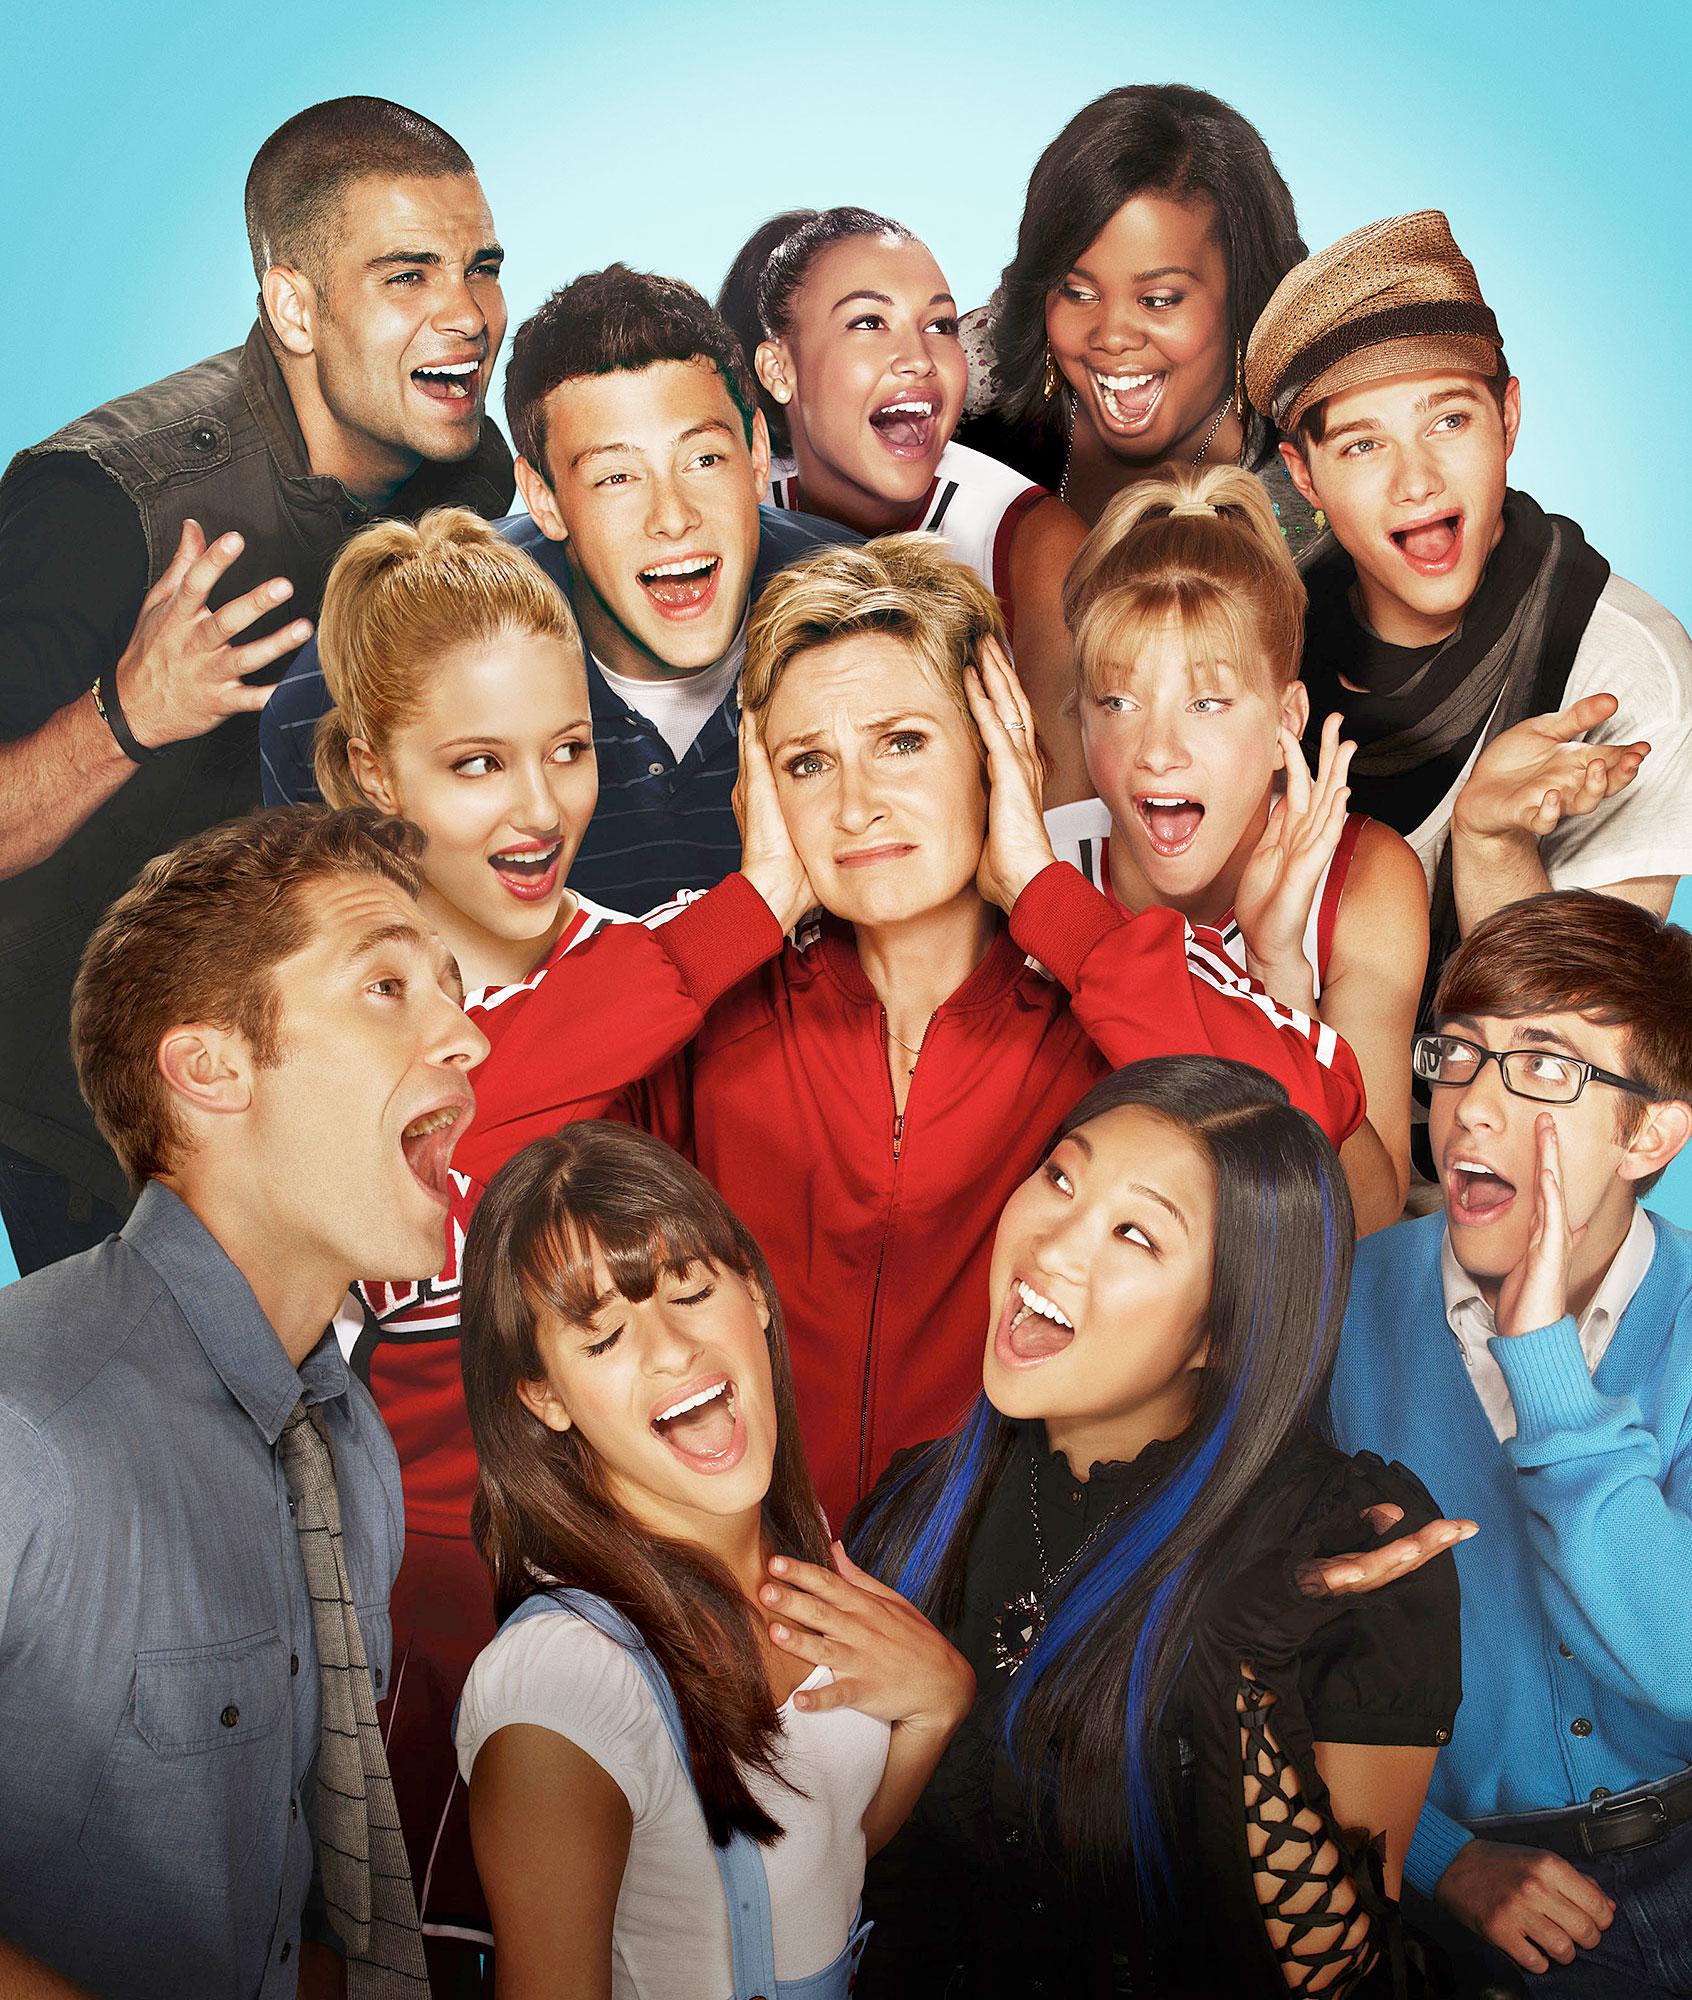 'Glee' Cast Organizes Fundraiser in Late Costar Naya Rivera's Memory